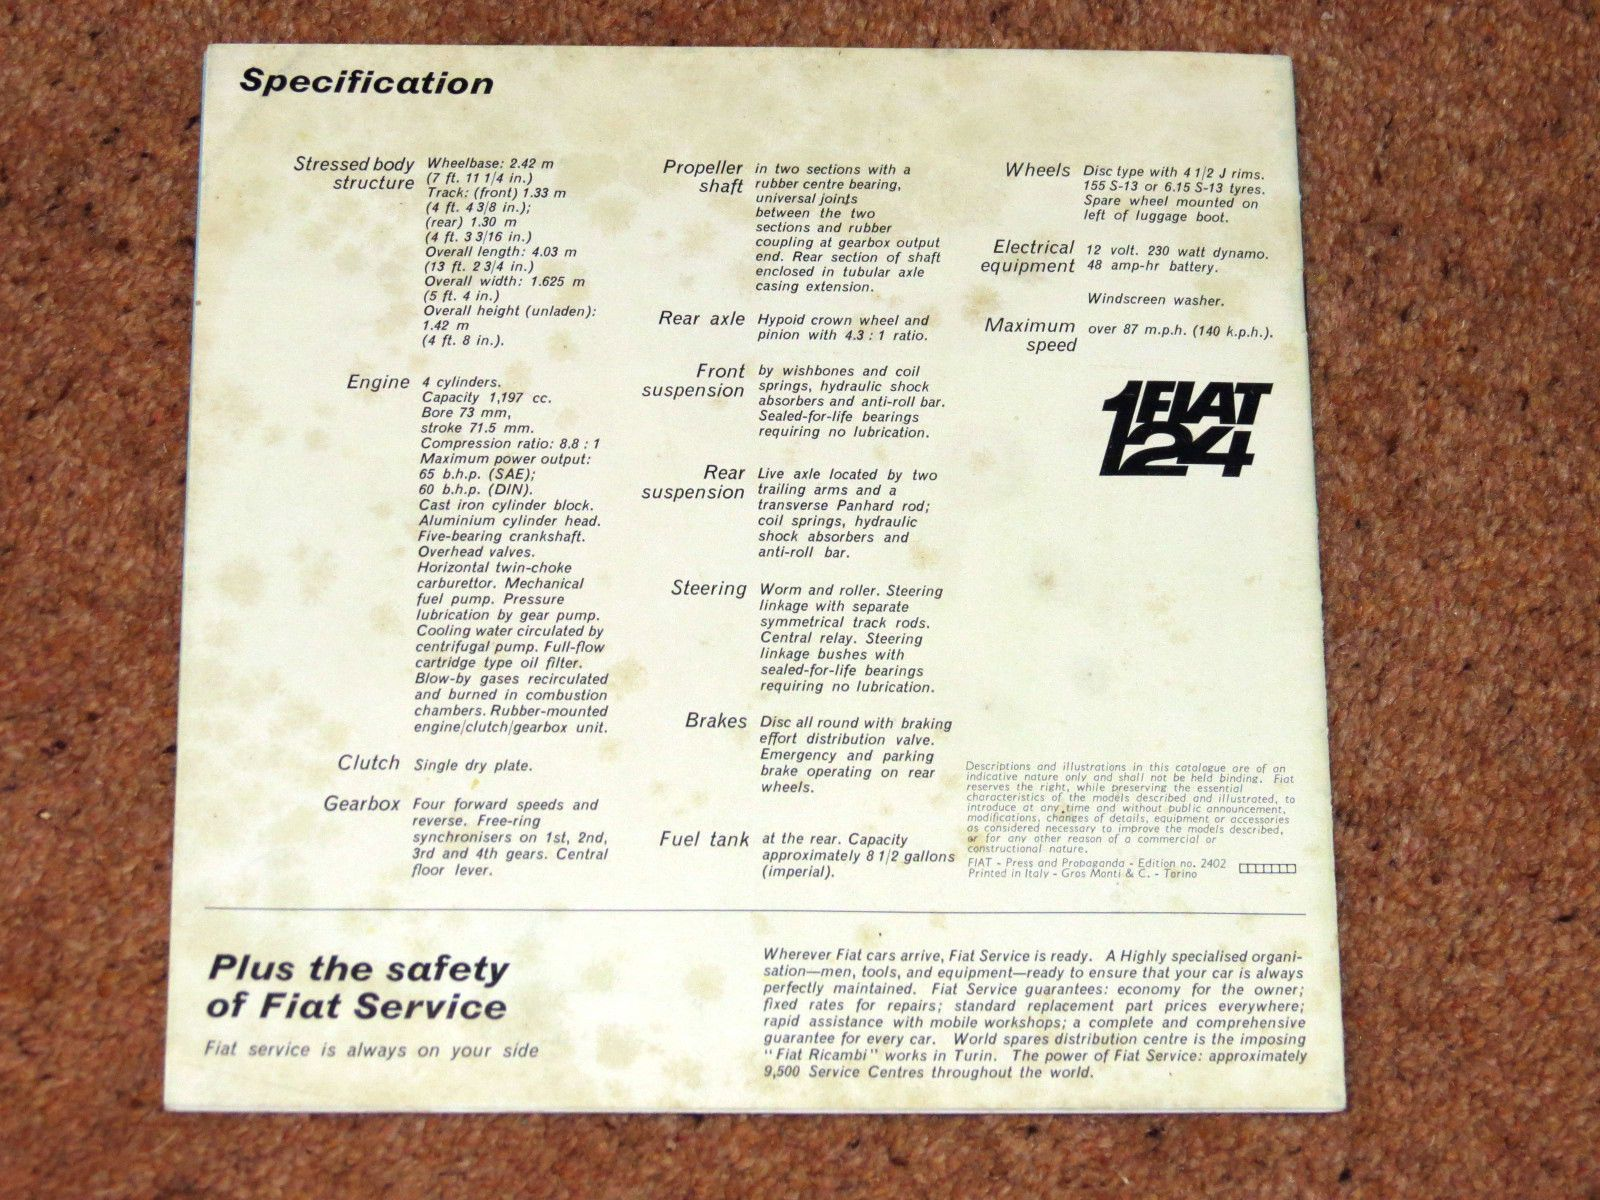 Fiat 124 Launch Brochure Circa 1966 67 In Vehicle Parts Rear Axle Schematic Accessories Car Manuals